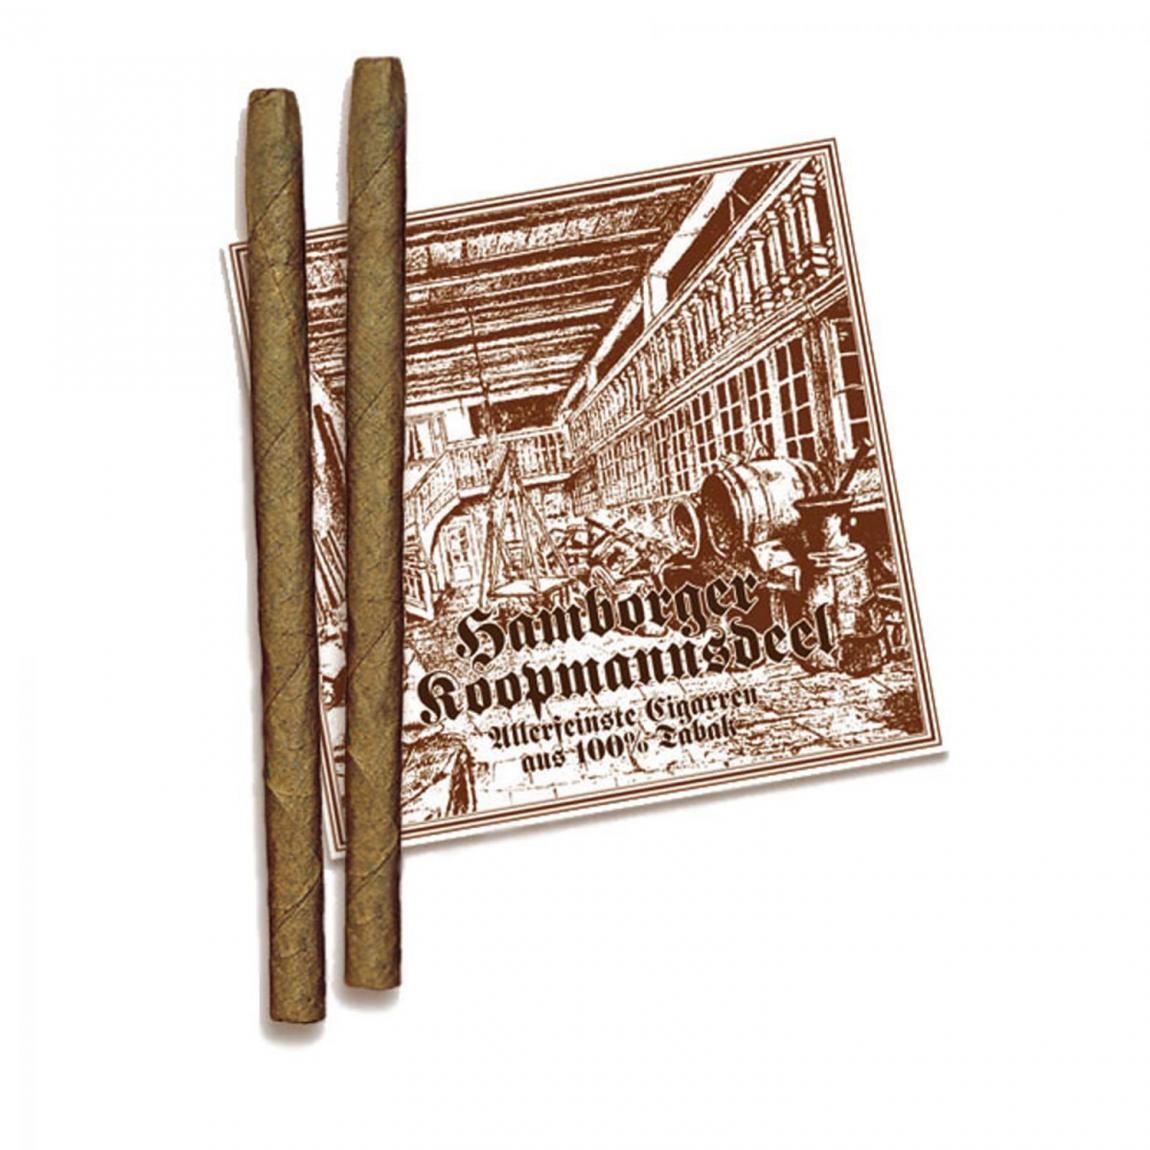 Hamborger Koopmannsdeel Sumatra No. 16 Long Cigarillo 50er Kiste